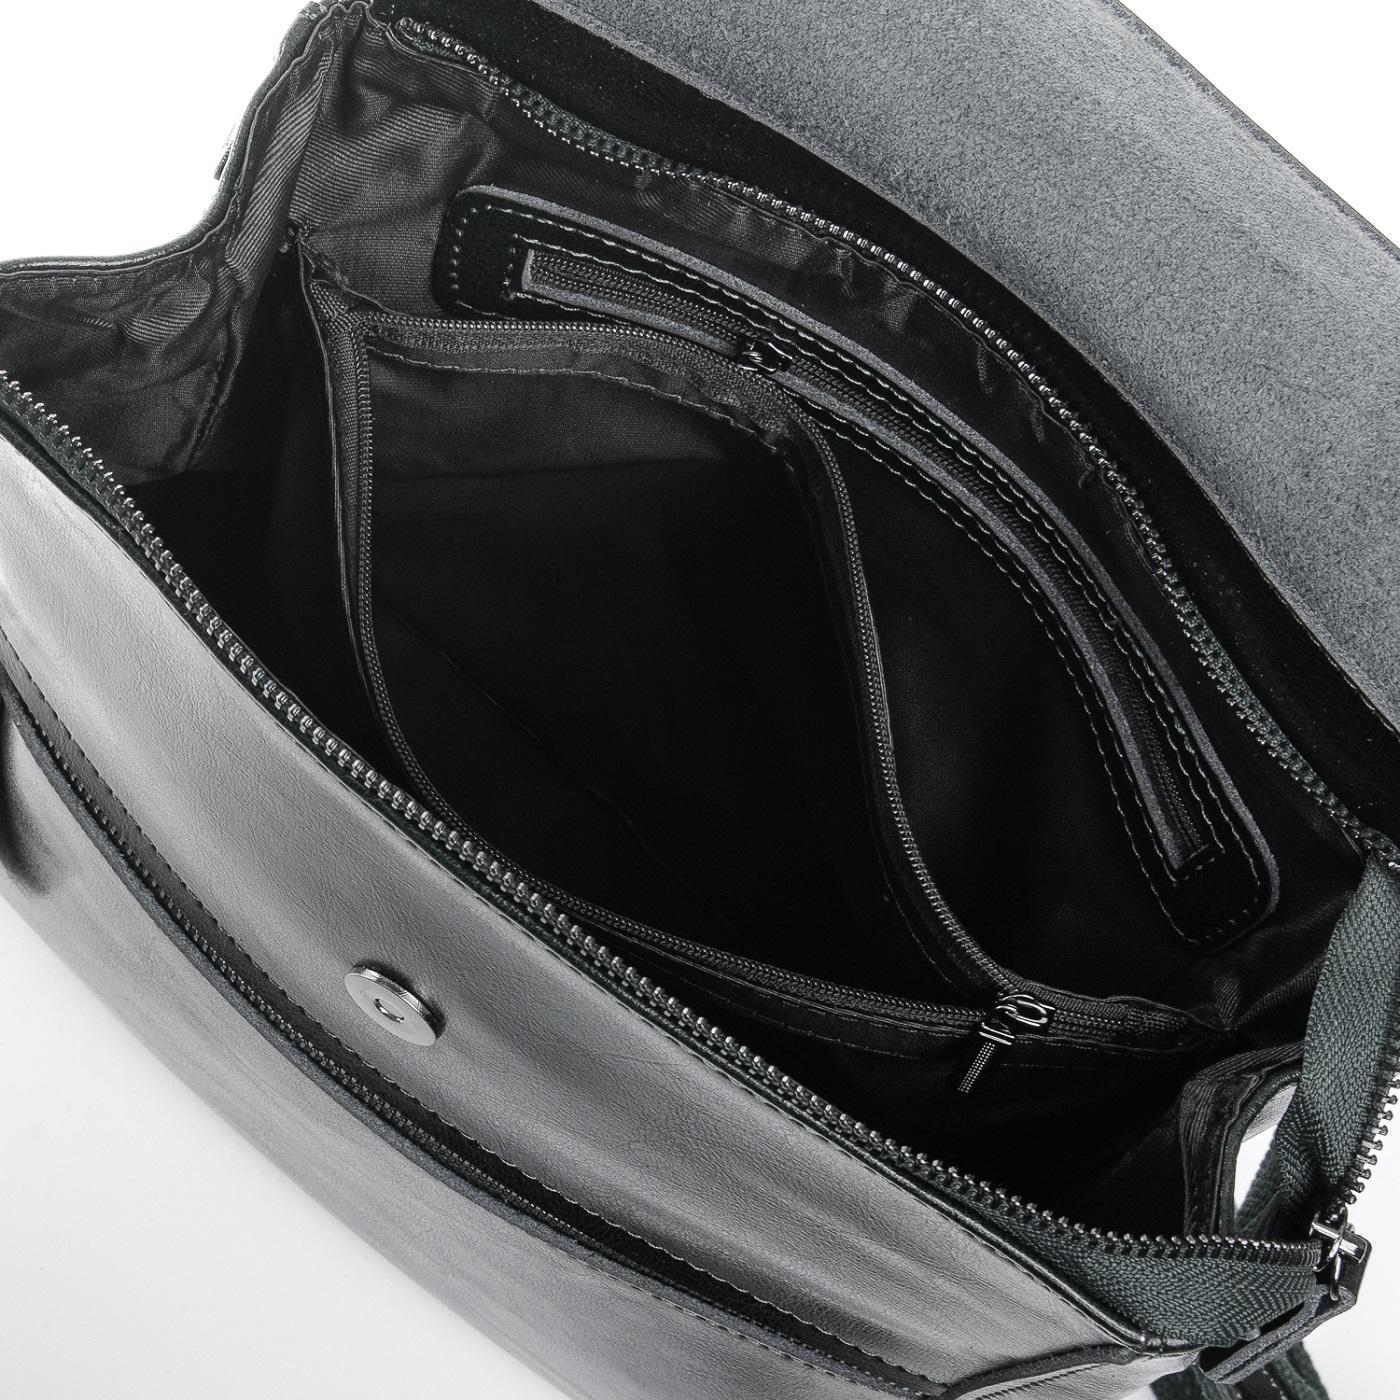 Сумка Женская Рюкзак кожа ALEX RAI 1-05 1005 black - фото 5